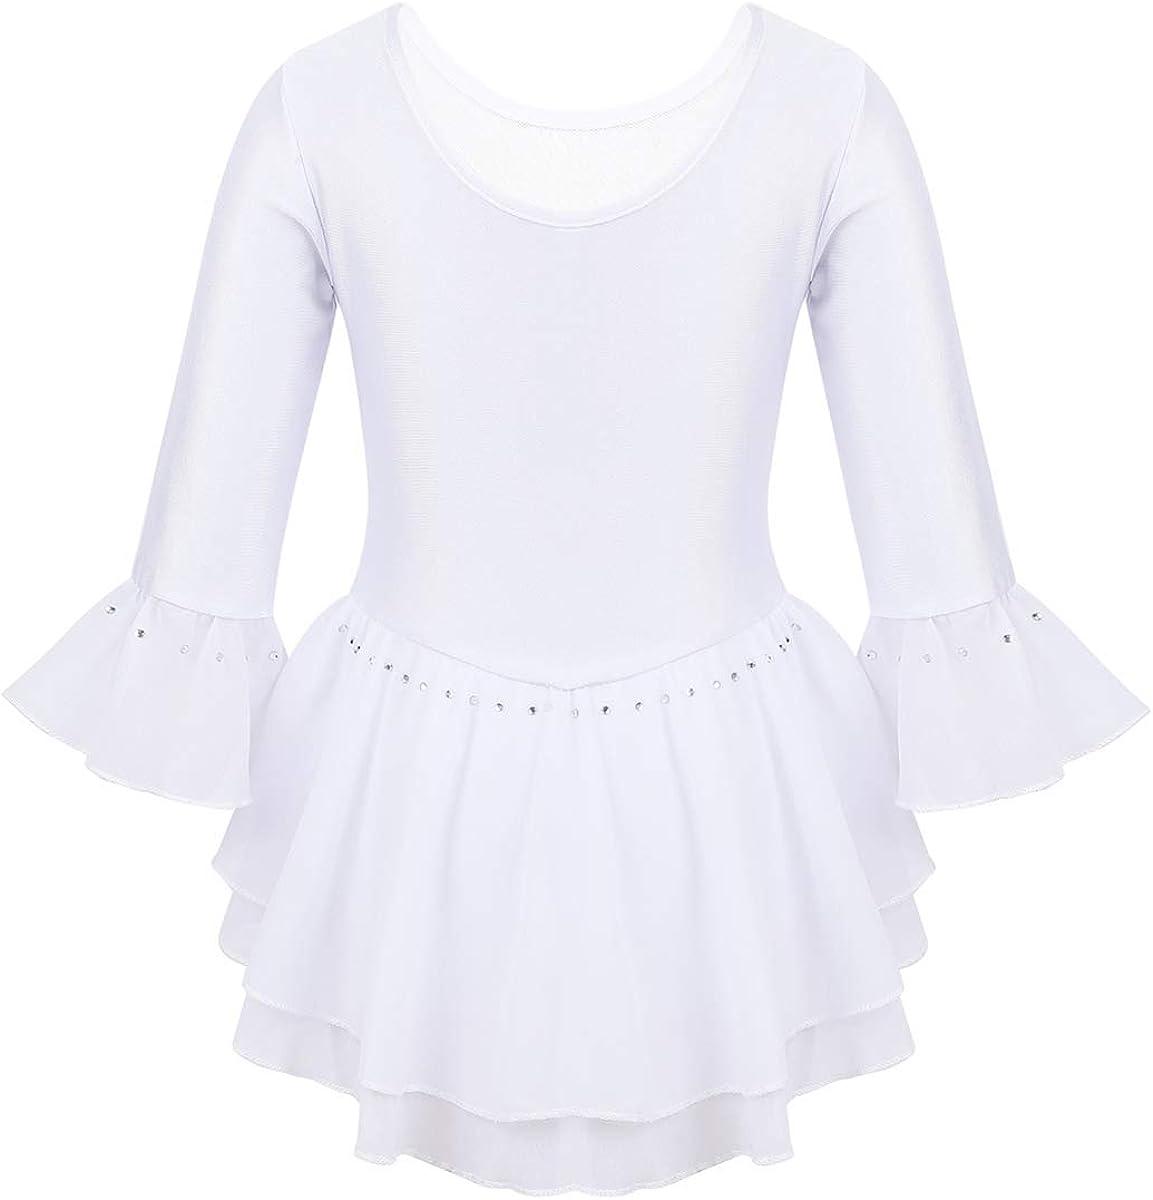 Freebily Vestido de Patinaje Art/ístico Ni/ña Maillot Gimnasia R/ítmica Mangas Largas Leotardo Gimnasia Falda Tut/ú Ballet Disfraz Bailarina de Baile Fiesta Actuaci/ón